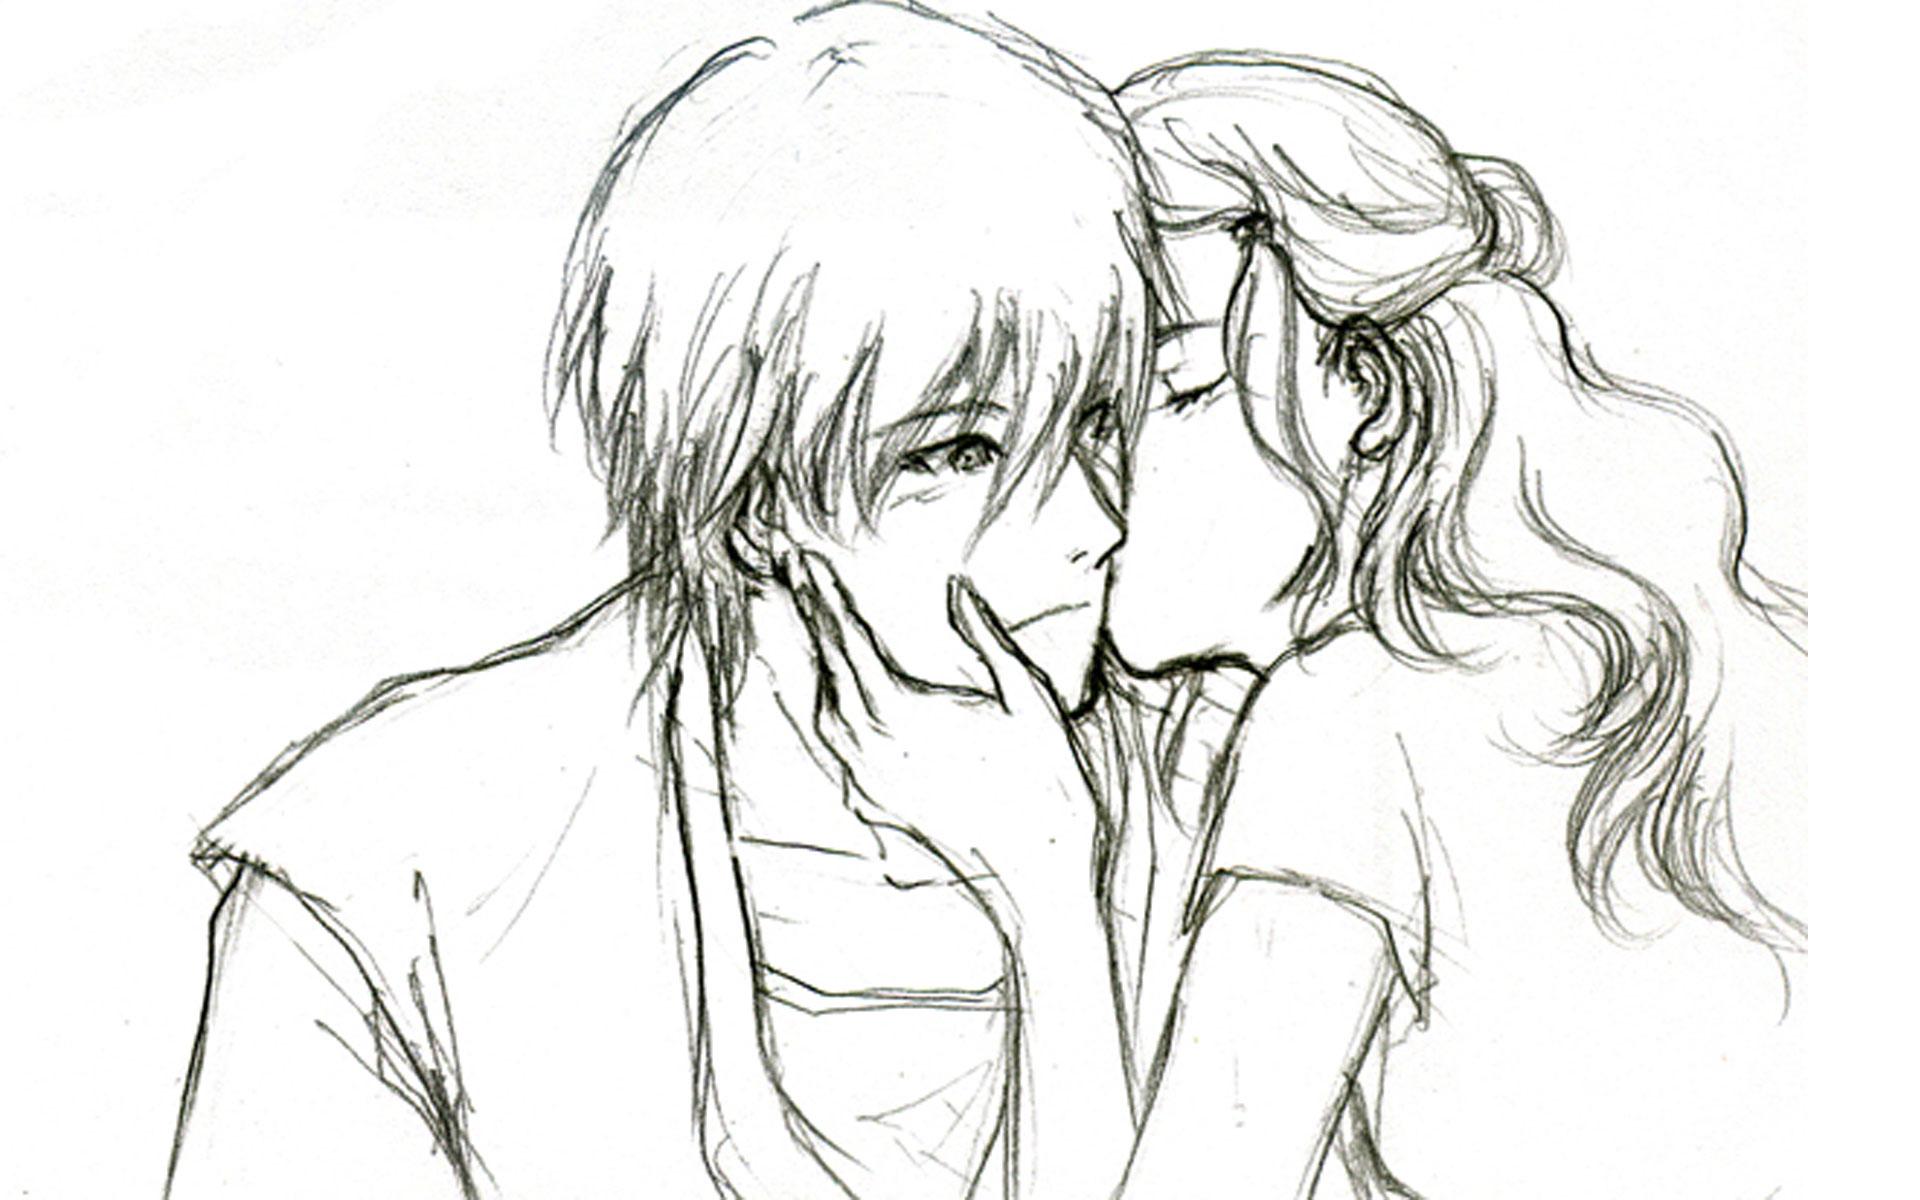 1920x1200 anime cute couple pencil sketch romantic anime couples kissing